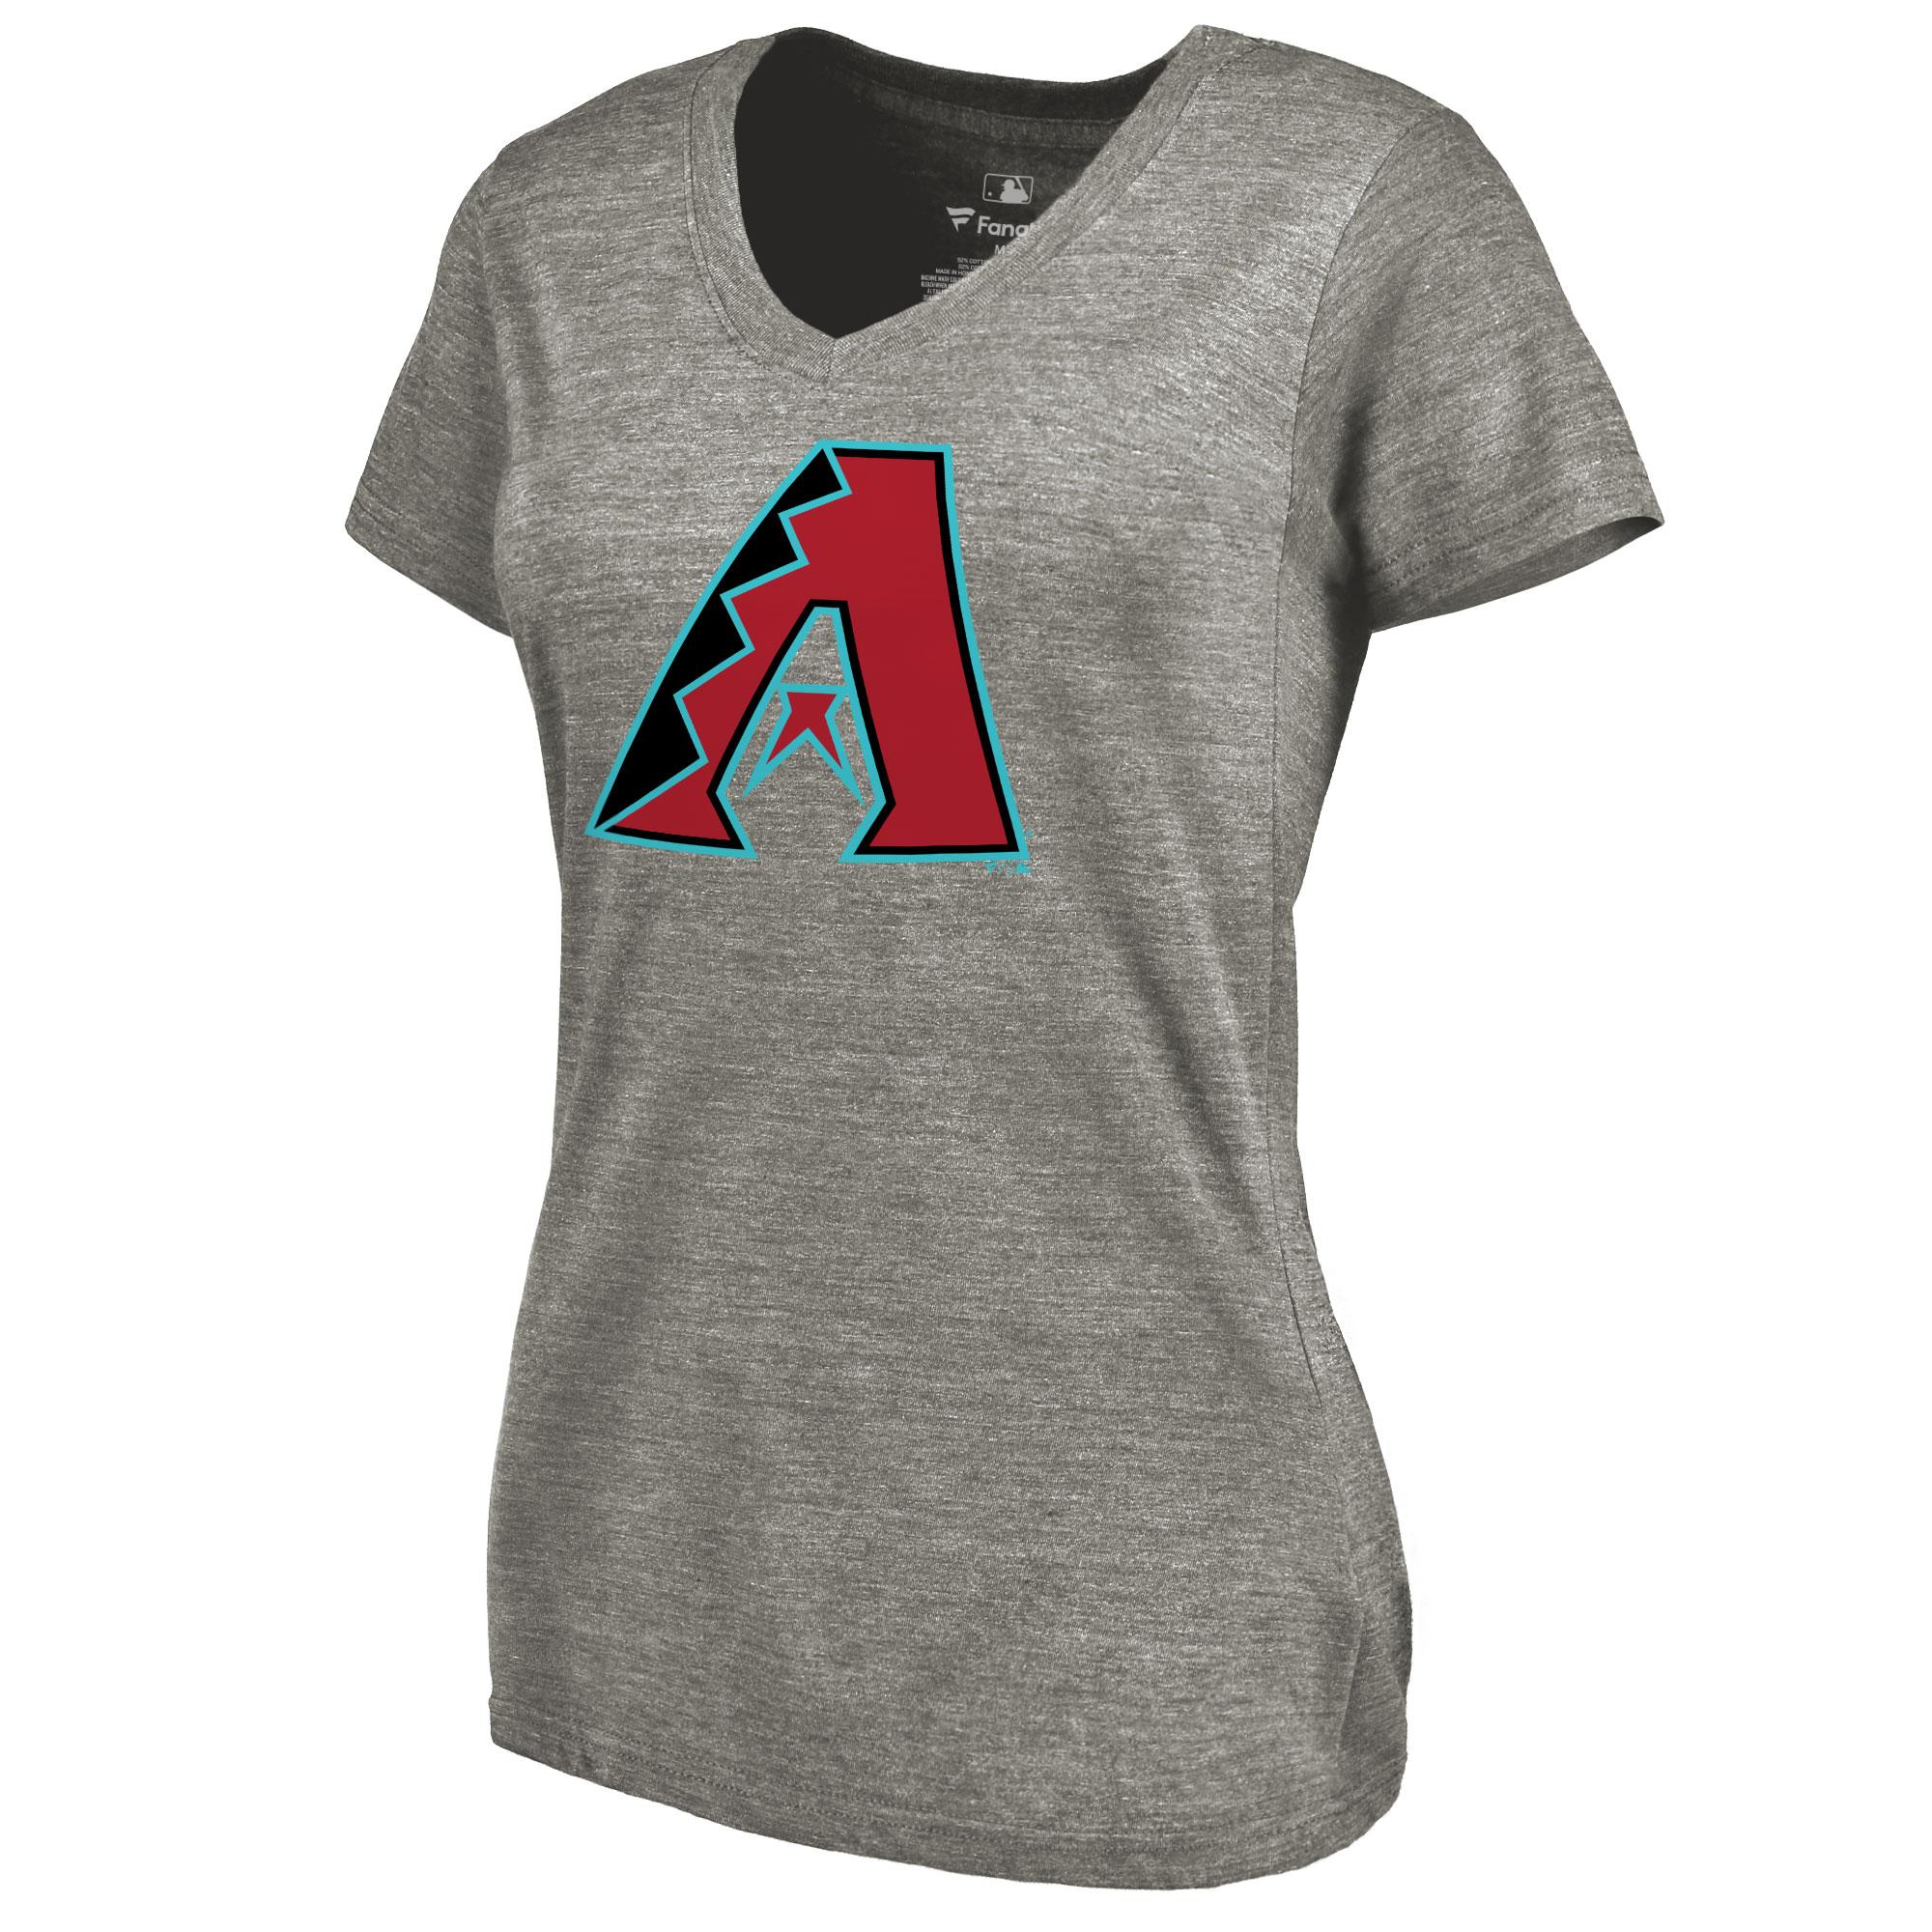 Arizona Diamondbacks Women's Primary Logo Tri-Blend V-Neck T-Shirt - Ash